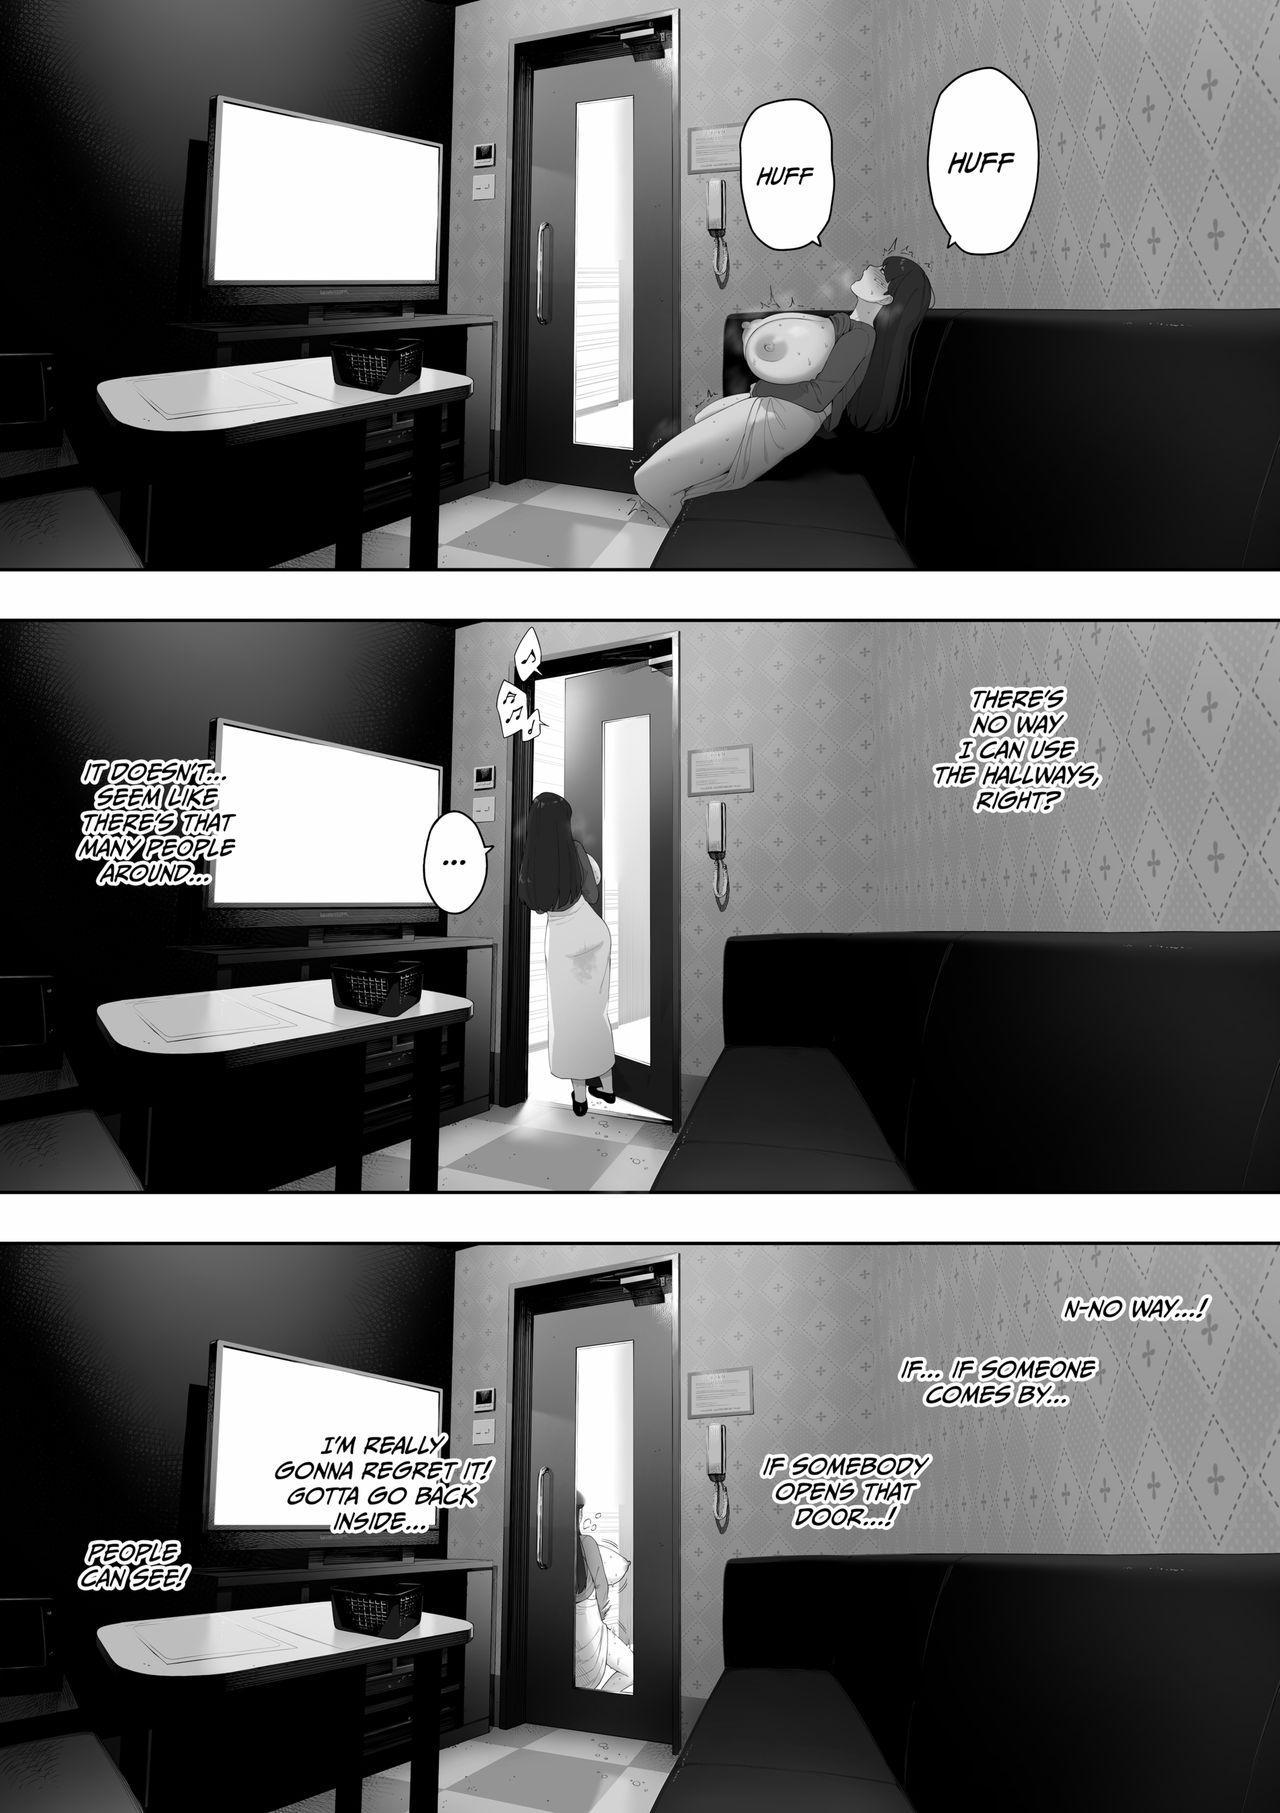 [NT Labo (NT Robo)] Aisai, Doui no Ue, Netorare Roshutsu | [NT Labo(NT Robo)] Cucked With_My Consent My Exhibitionist Wife [English] 6